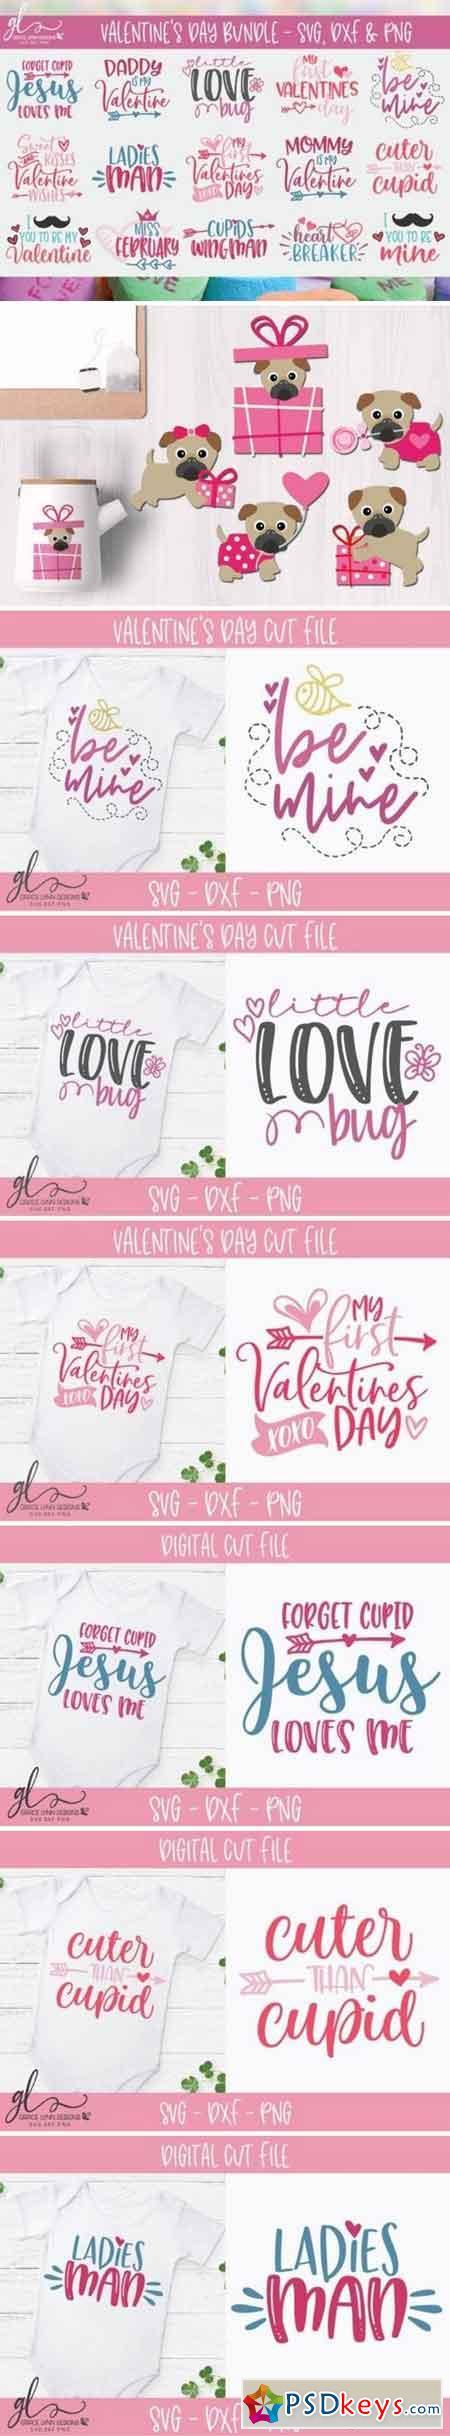 Valentine's Day SVG Bundle